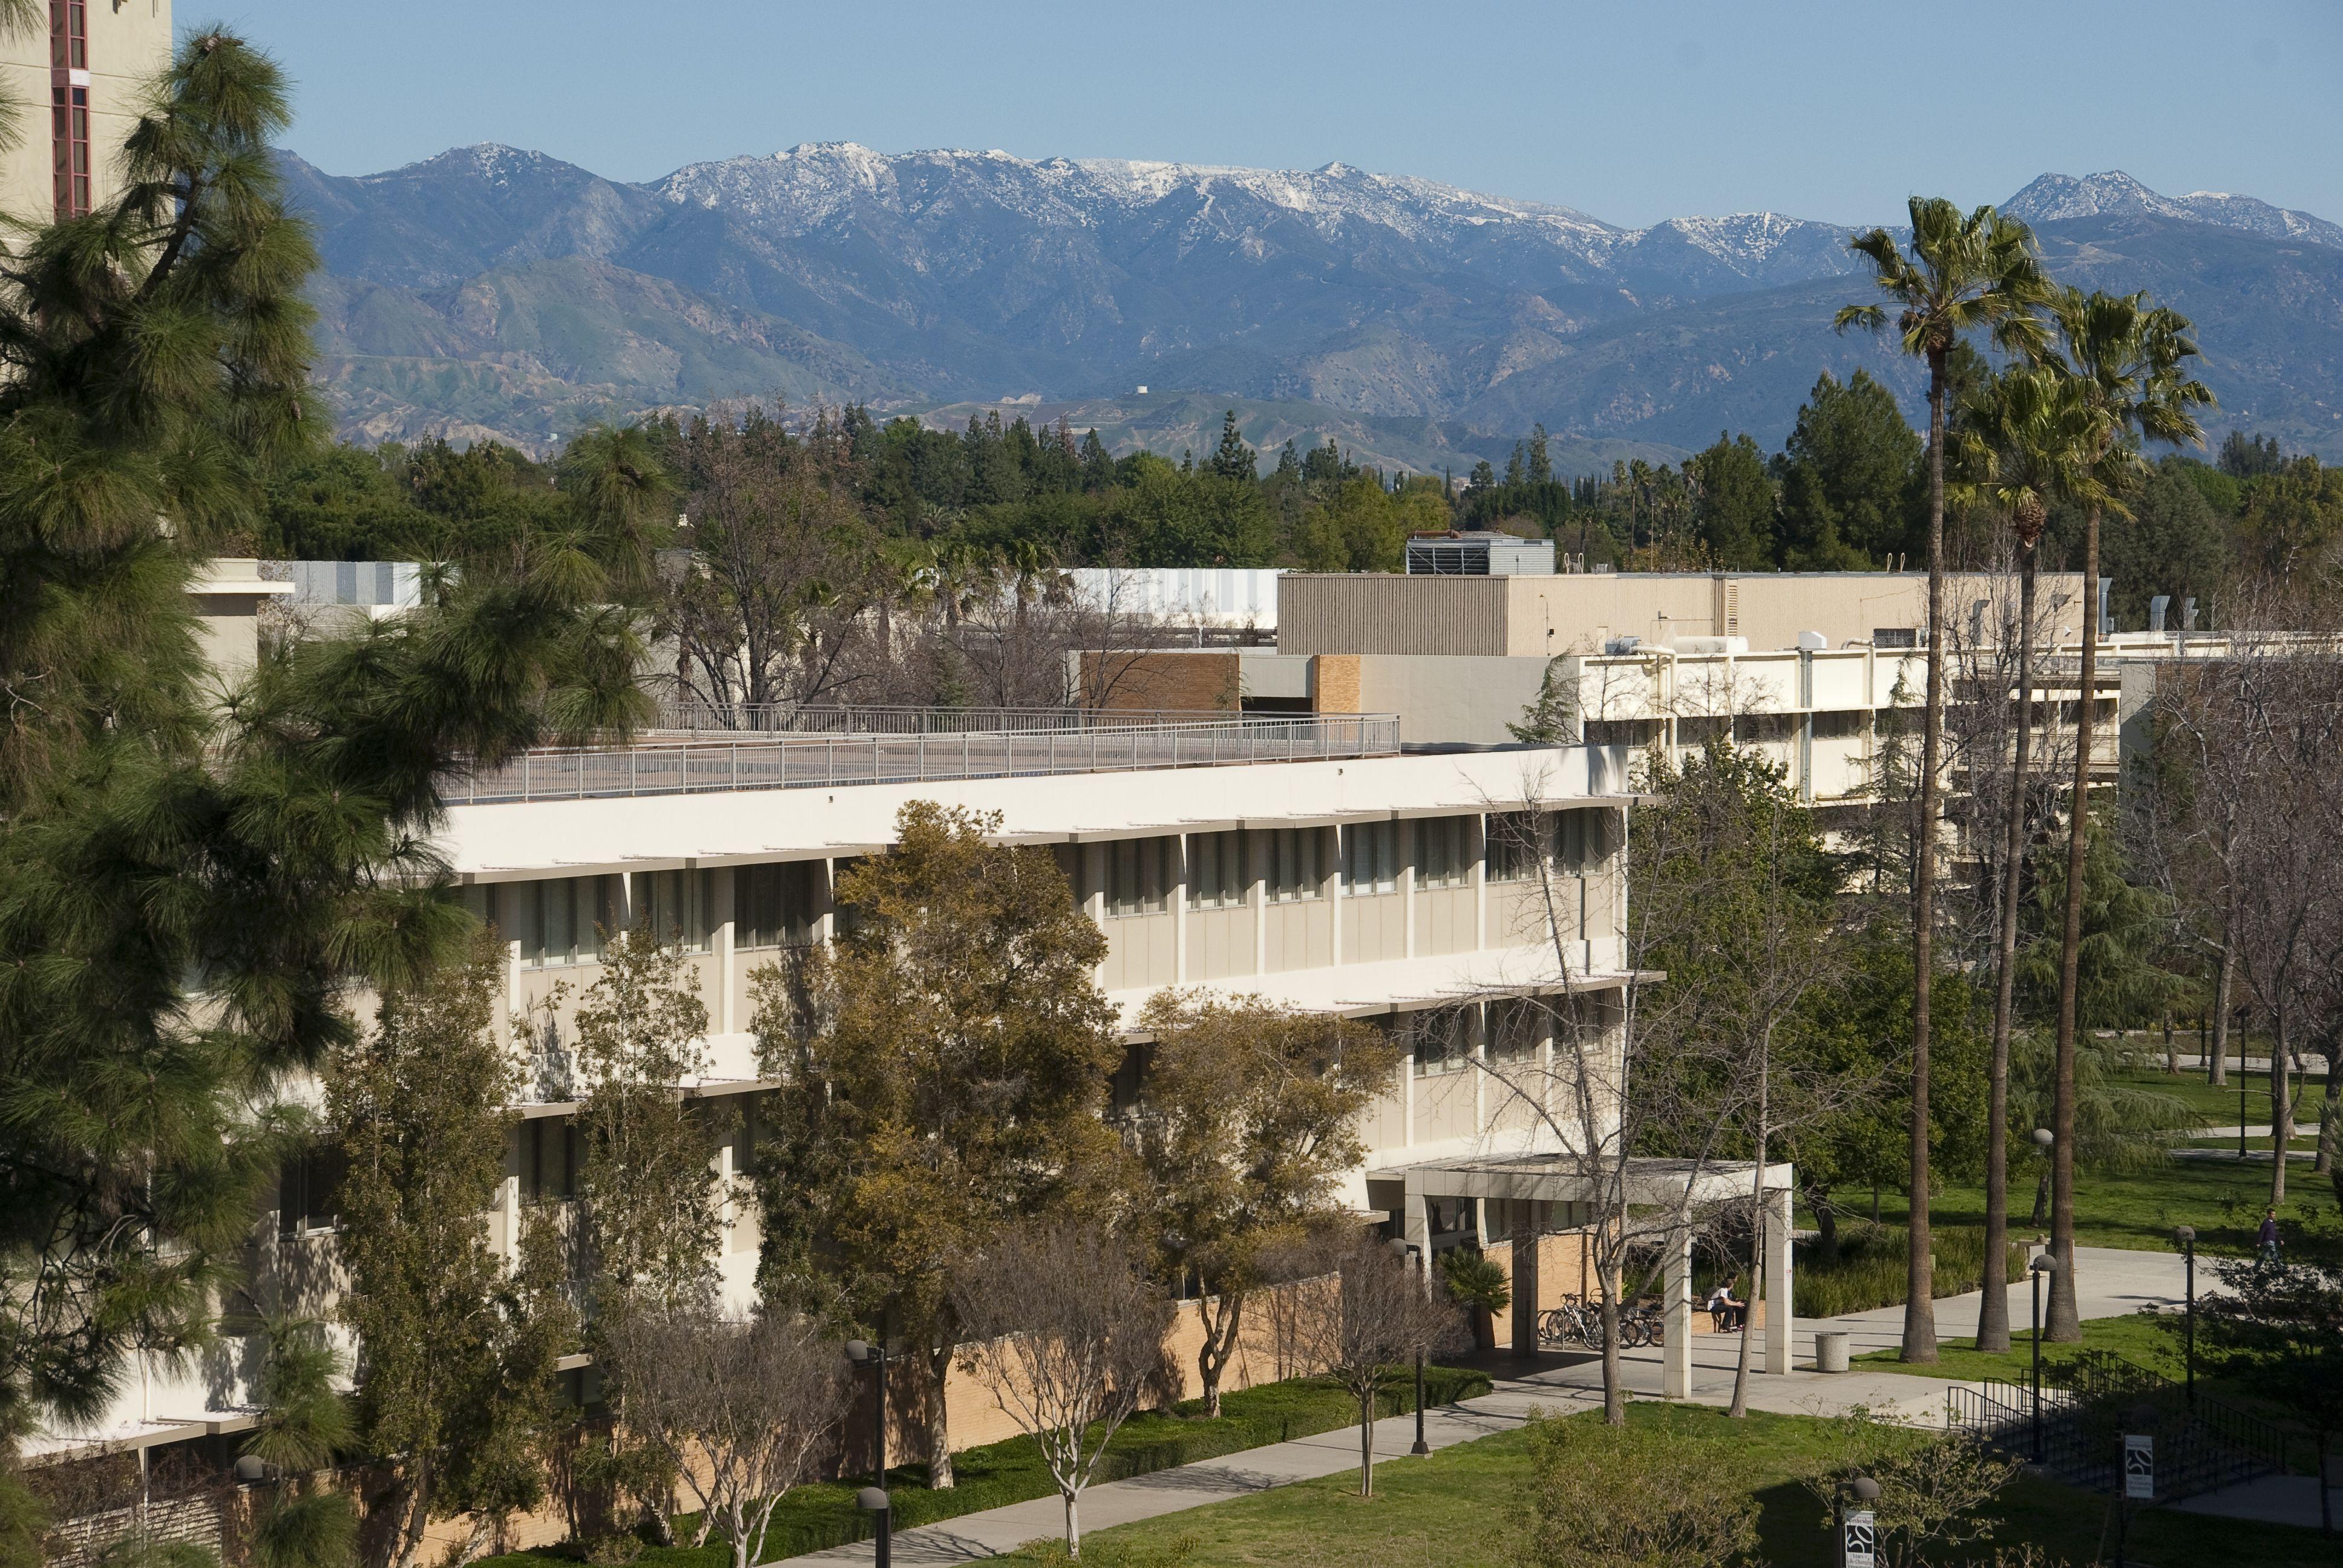 Sierra Hall | Explore CSUN | Pinterest | California state university ...